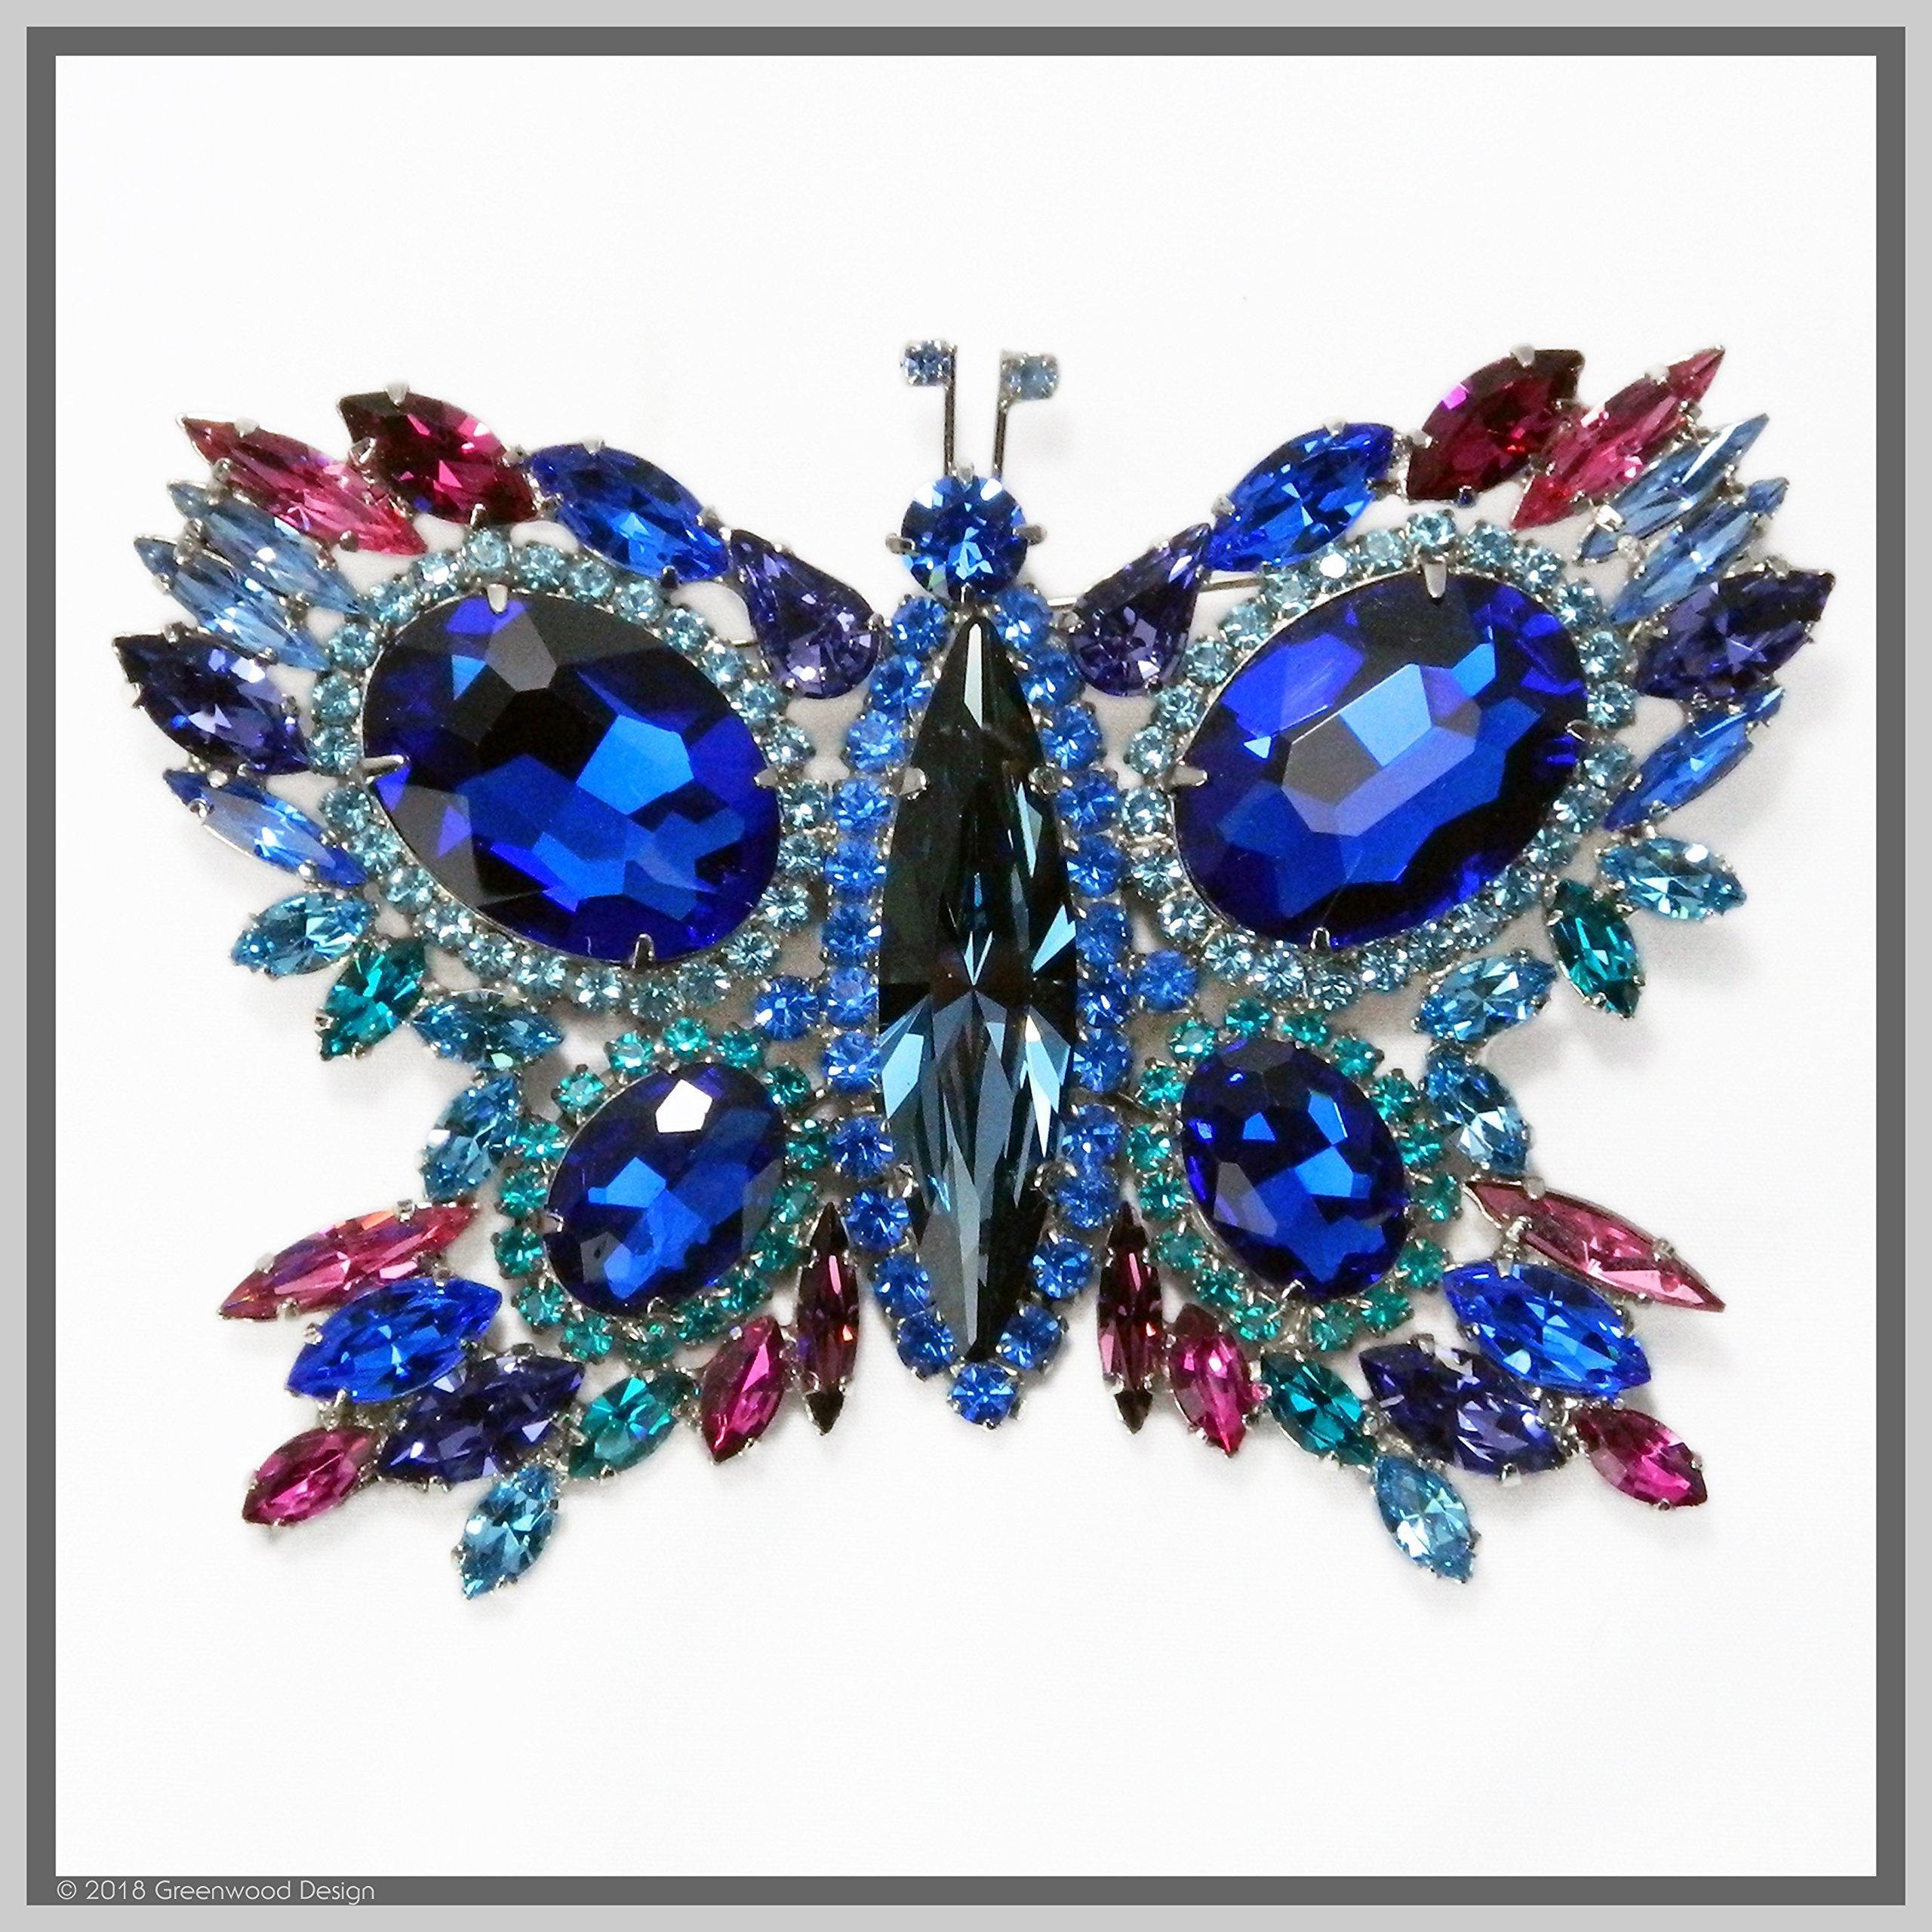 Hand Made Jewelry Art Butterfly Brooch Pin Cobalt Blue Winged Swarovski Crystal Rhinestones